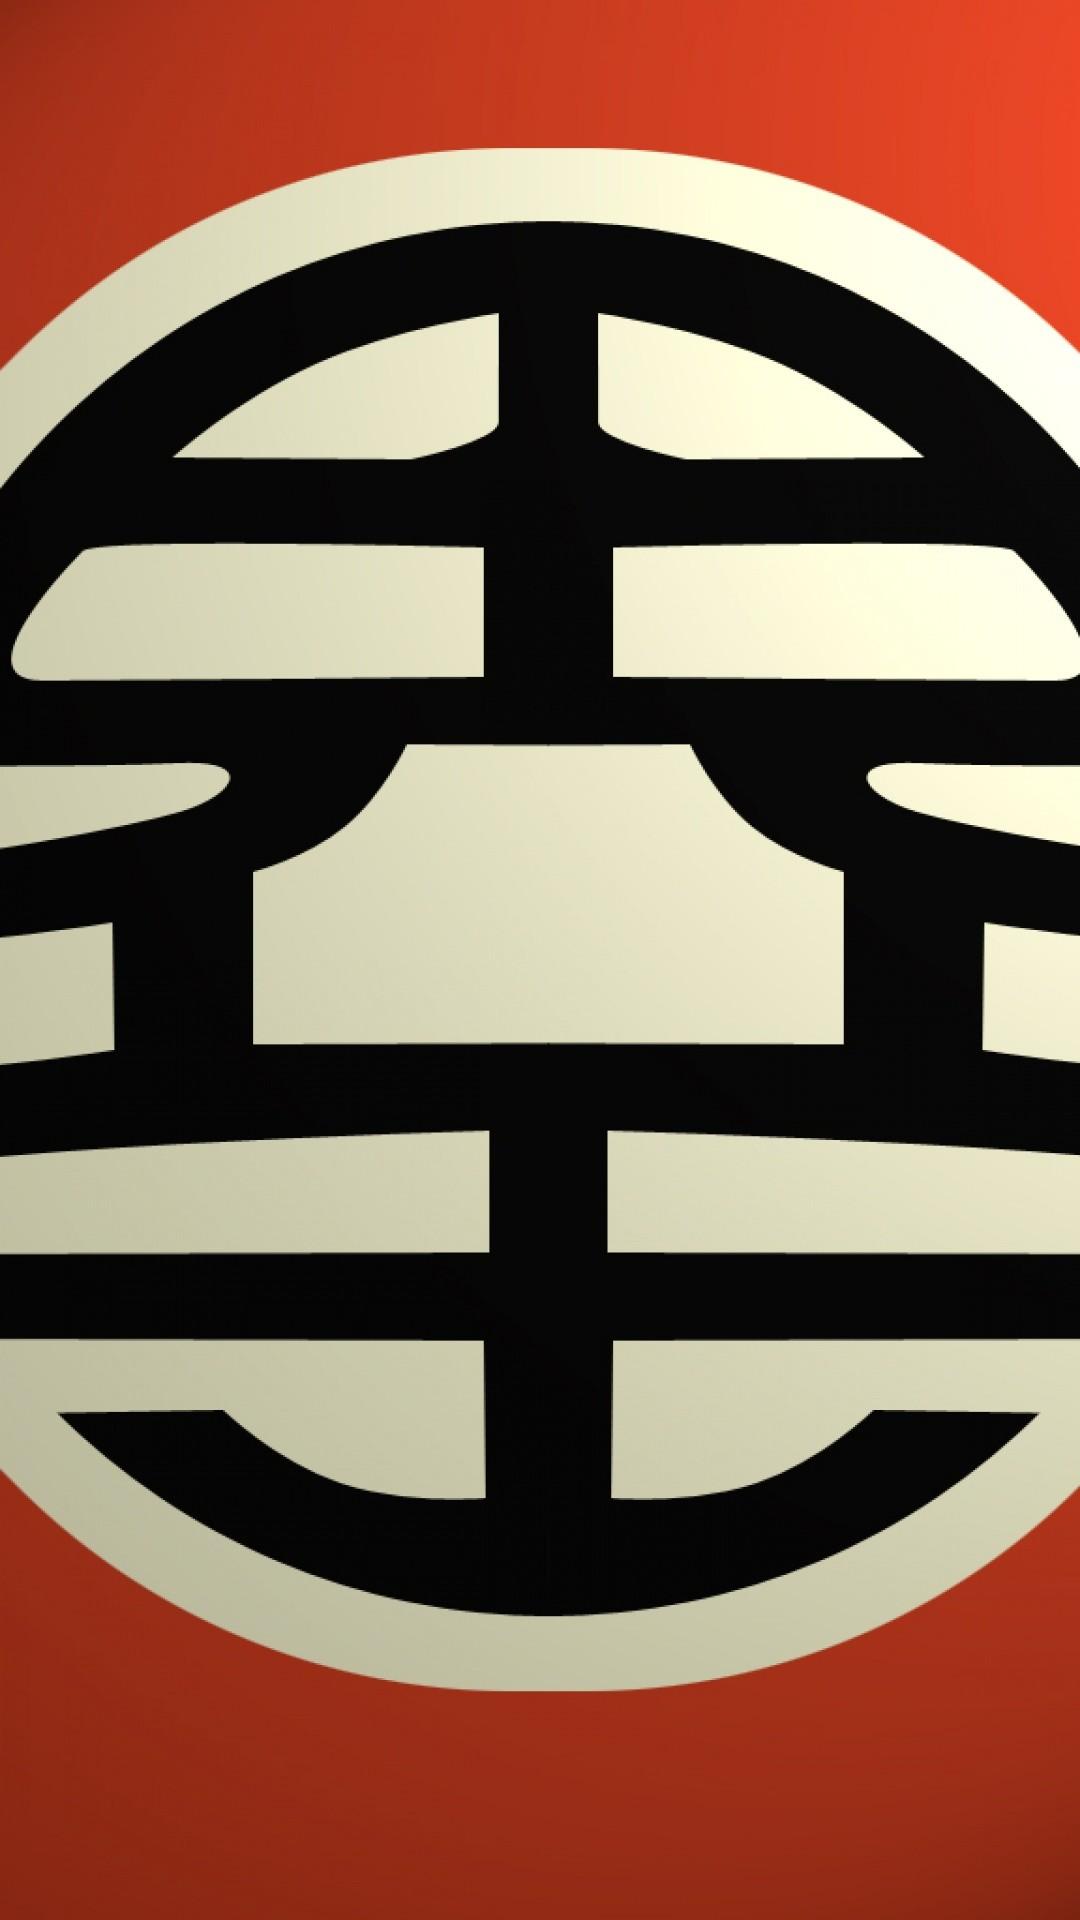 resized_daf_6838_dragon_ball_z_hd_wallpapers-by-f_vilanova